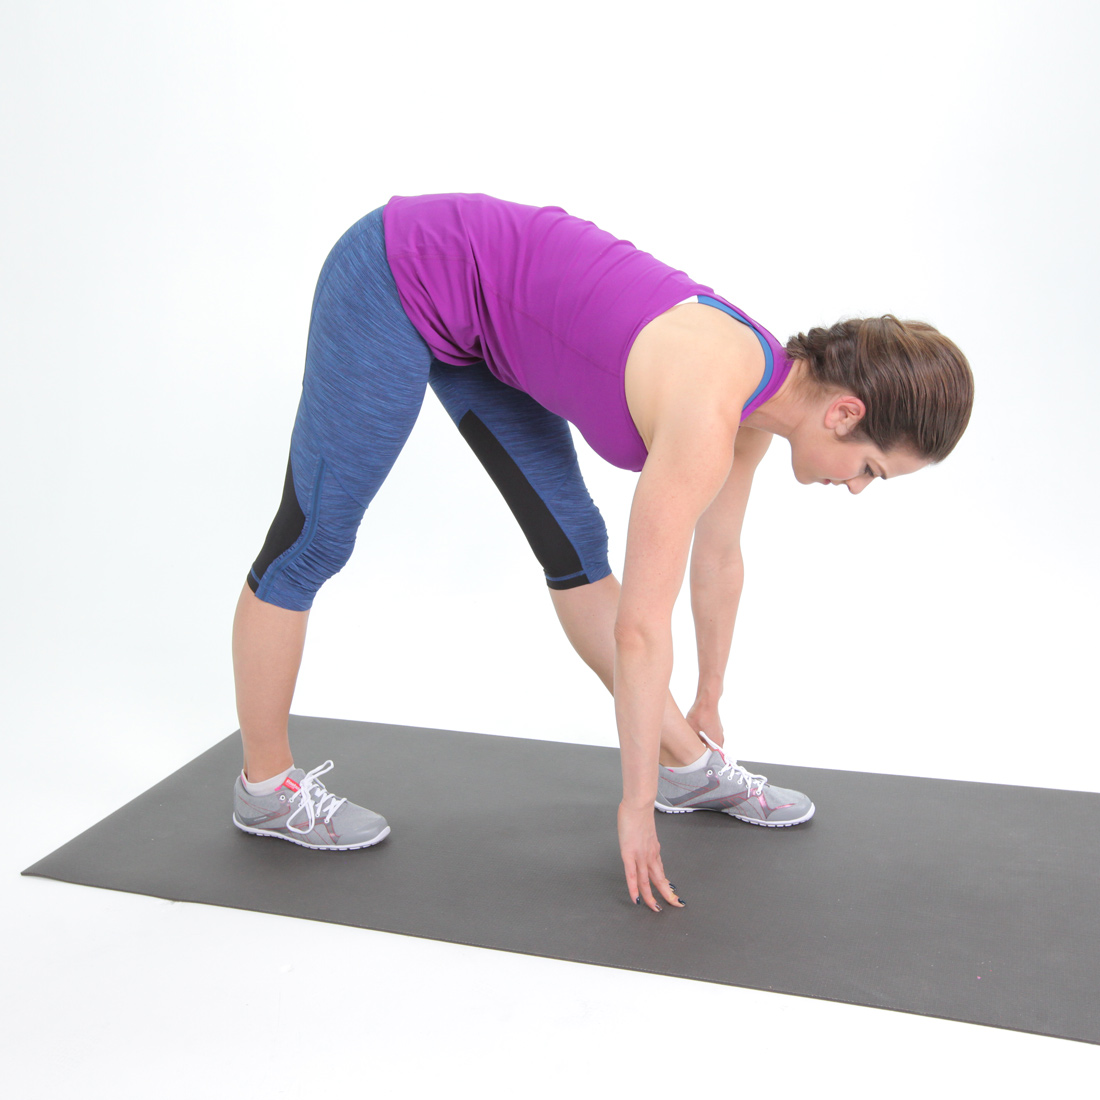 Scissor Hamstring Stretch